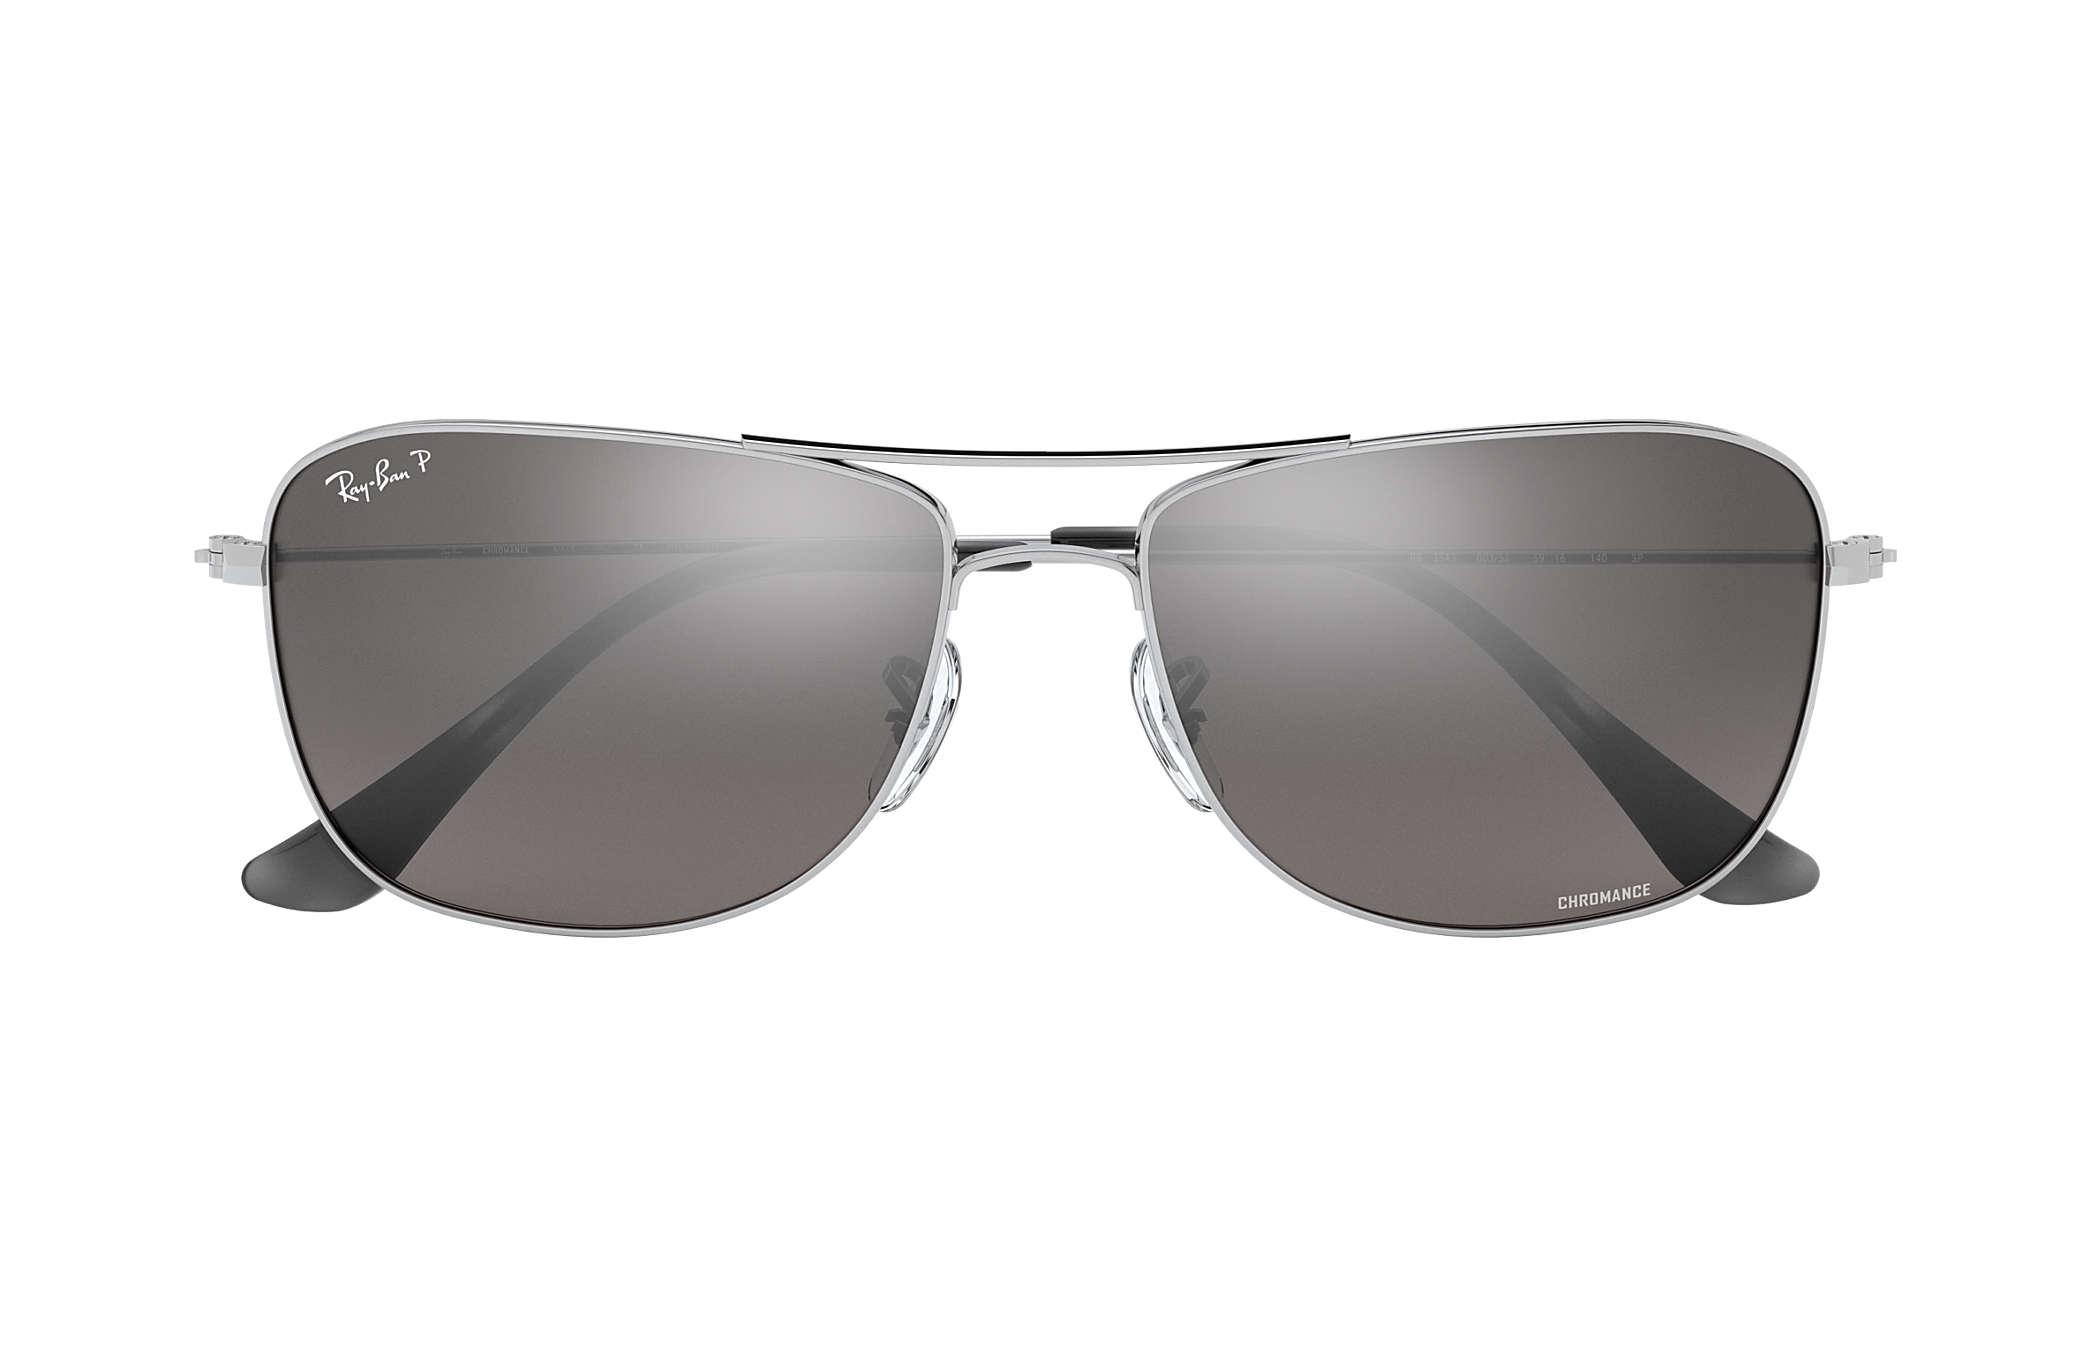 18dfb8724a7 Ray-Ban Rb3543 Chromance RB3543 Silver - Metal - Silver Polarized ...